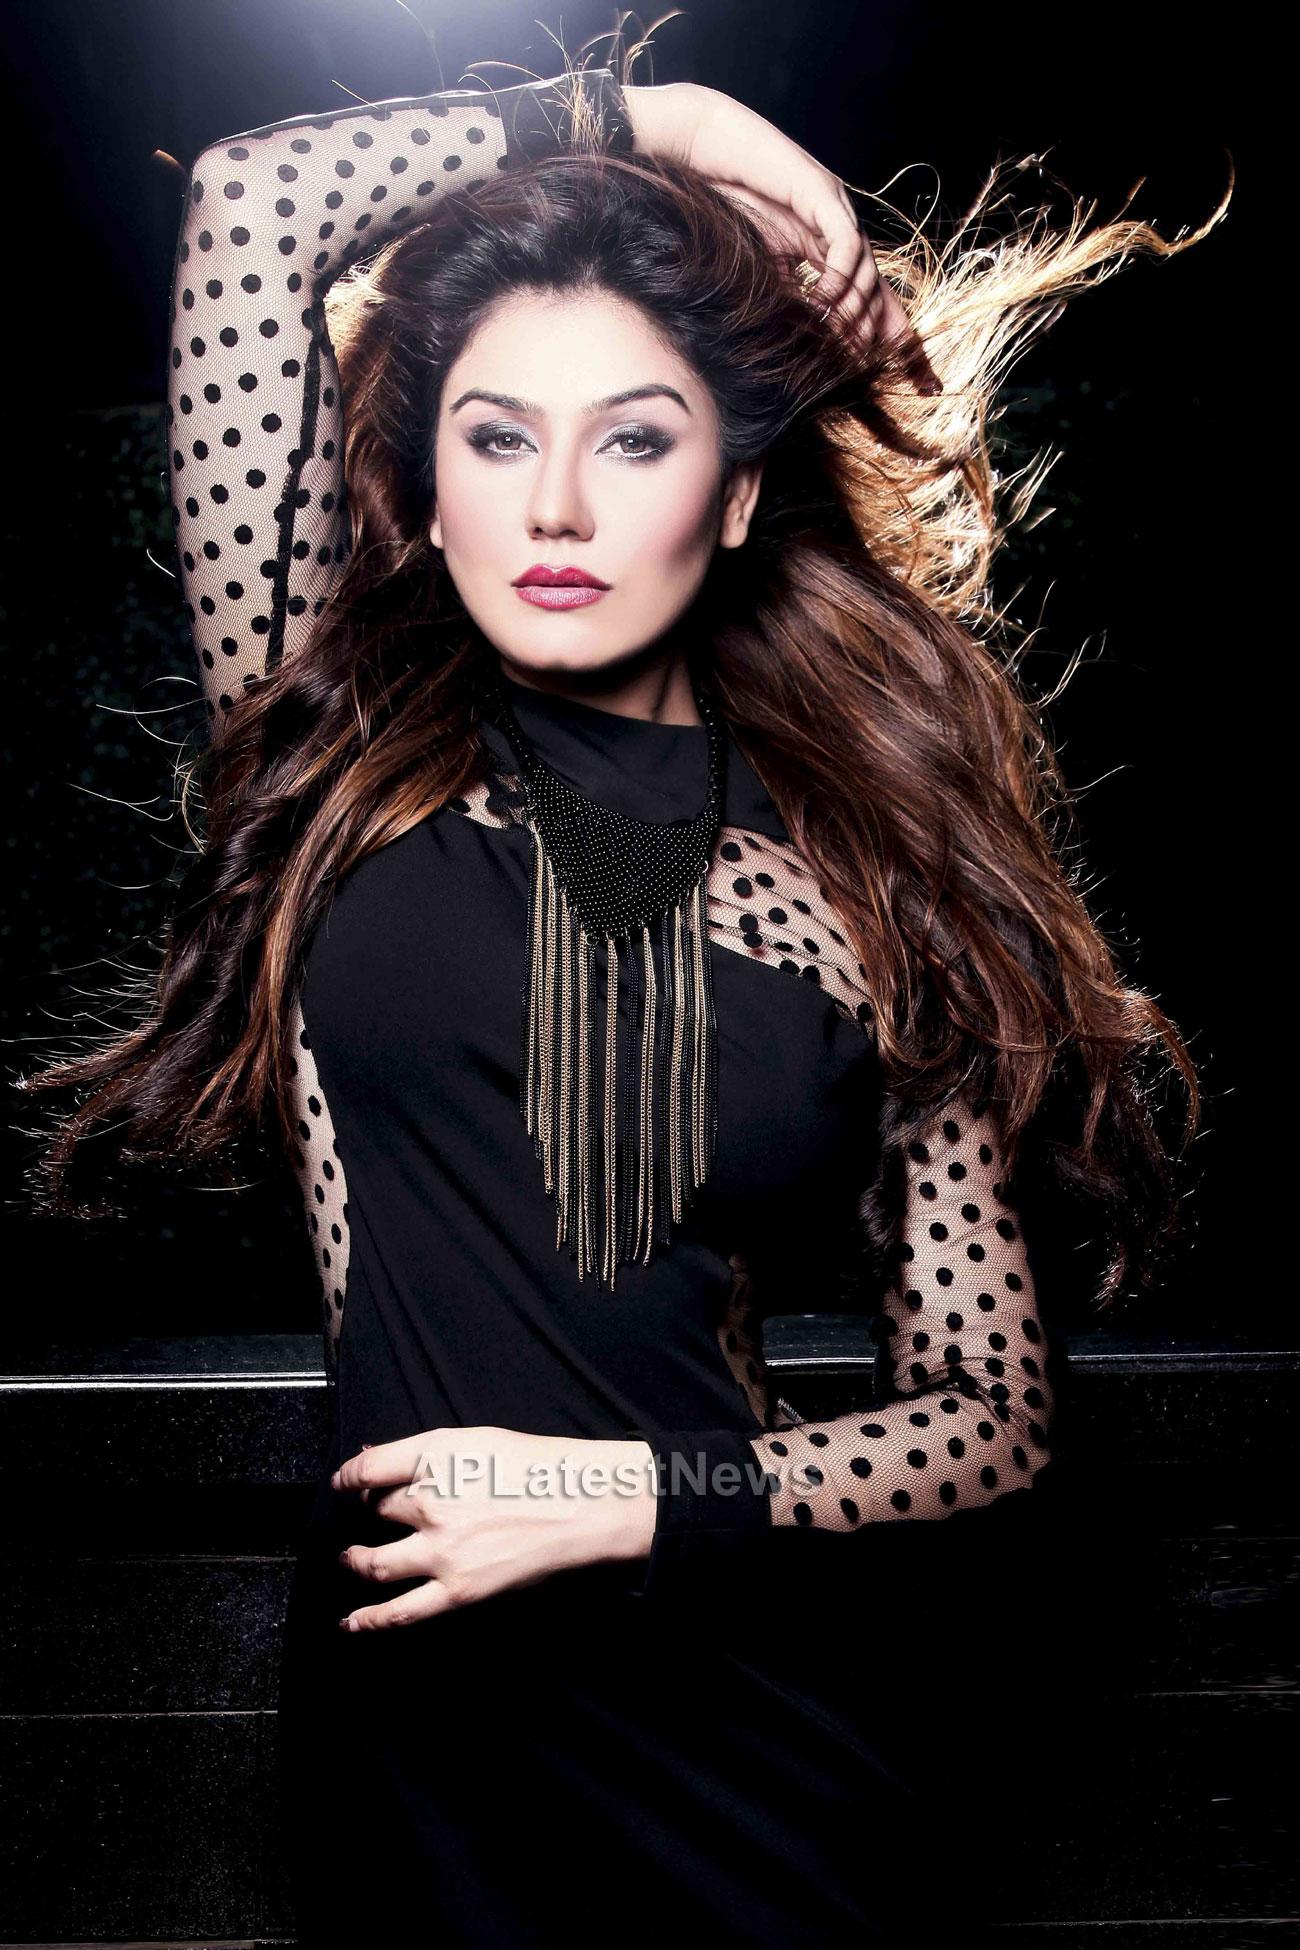 Bollywood actress Kangna Sharma turns Singer - Picture 5